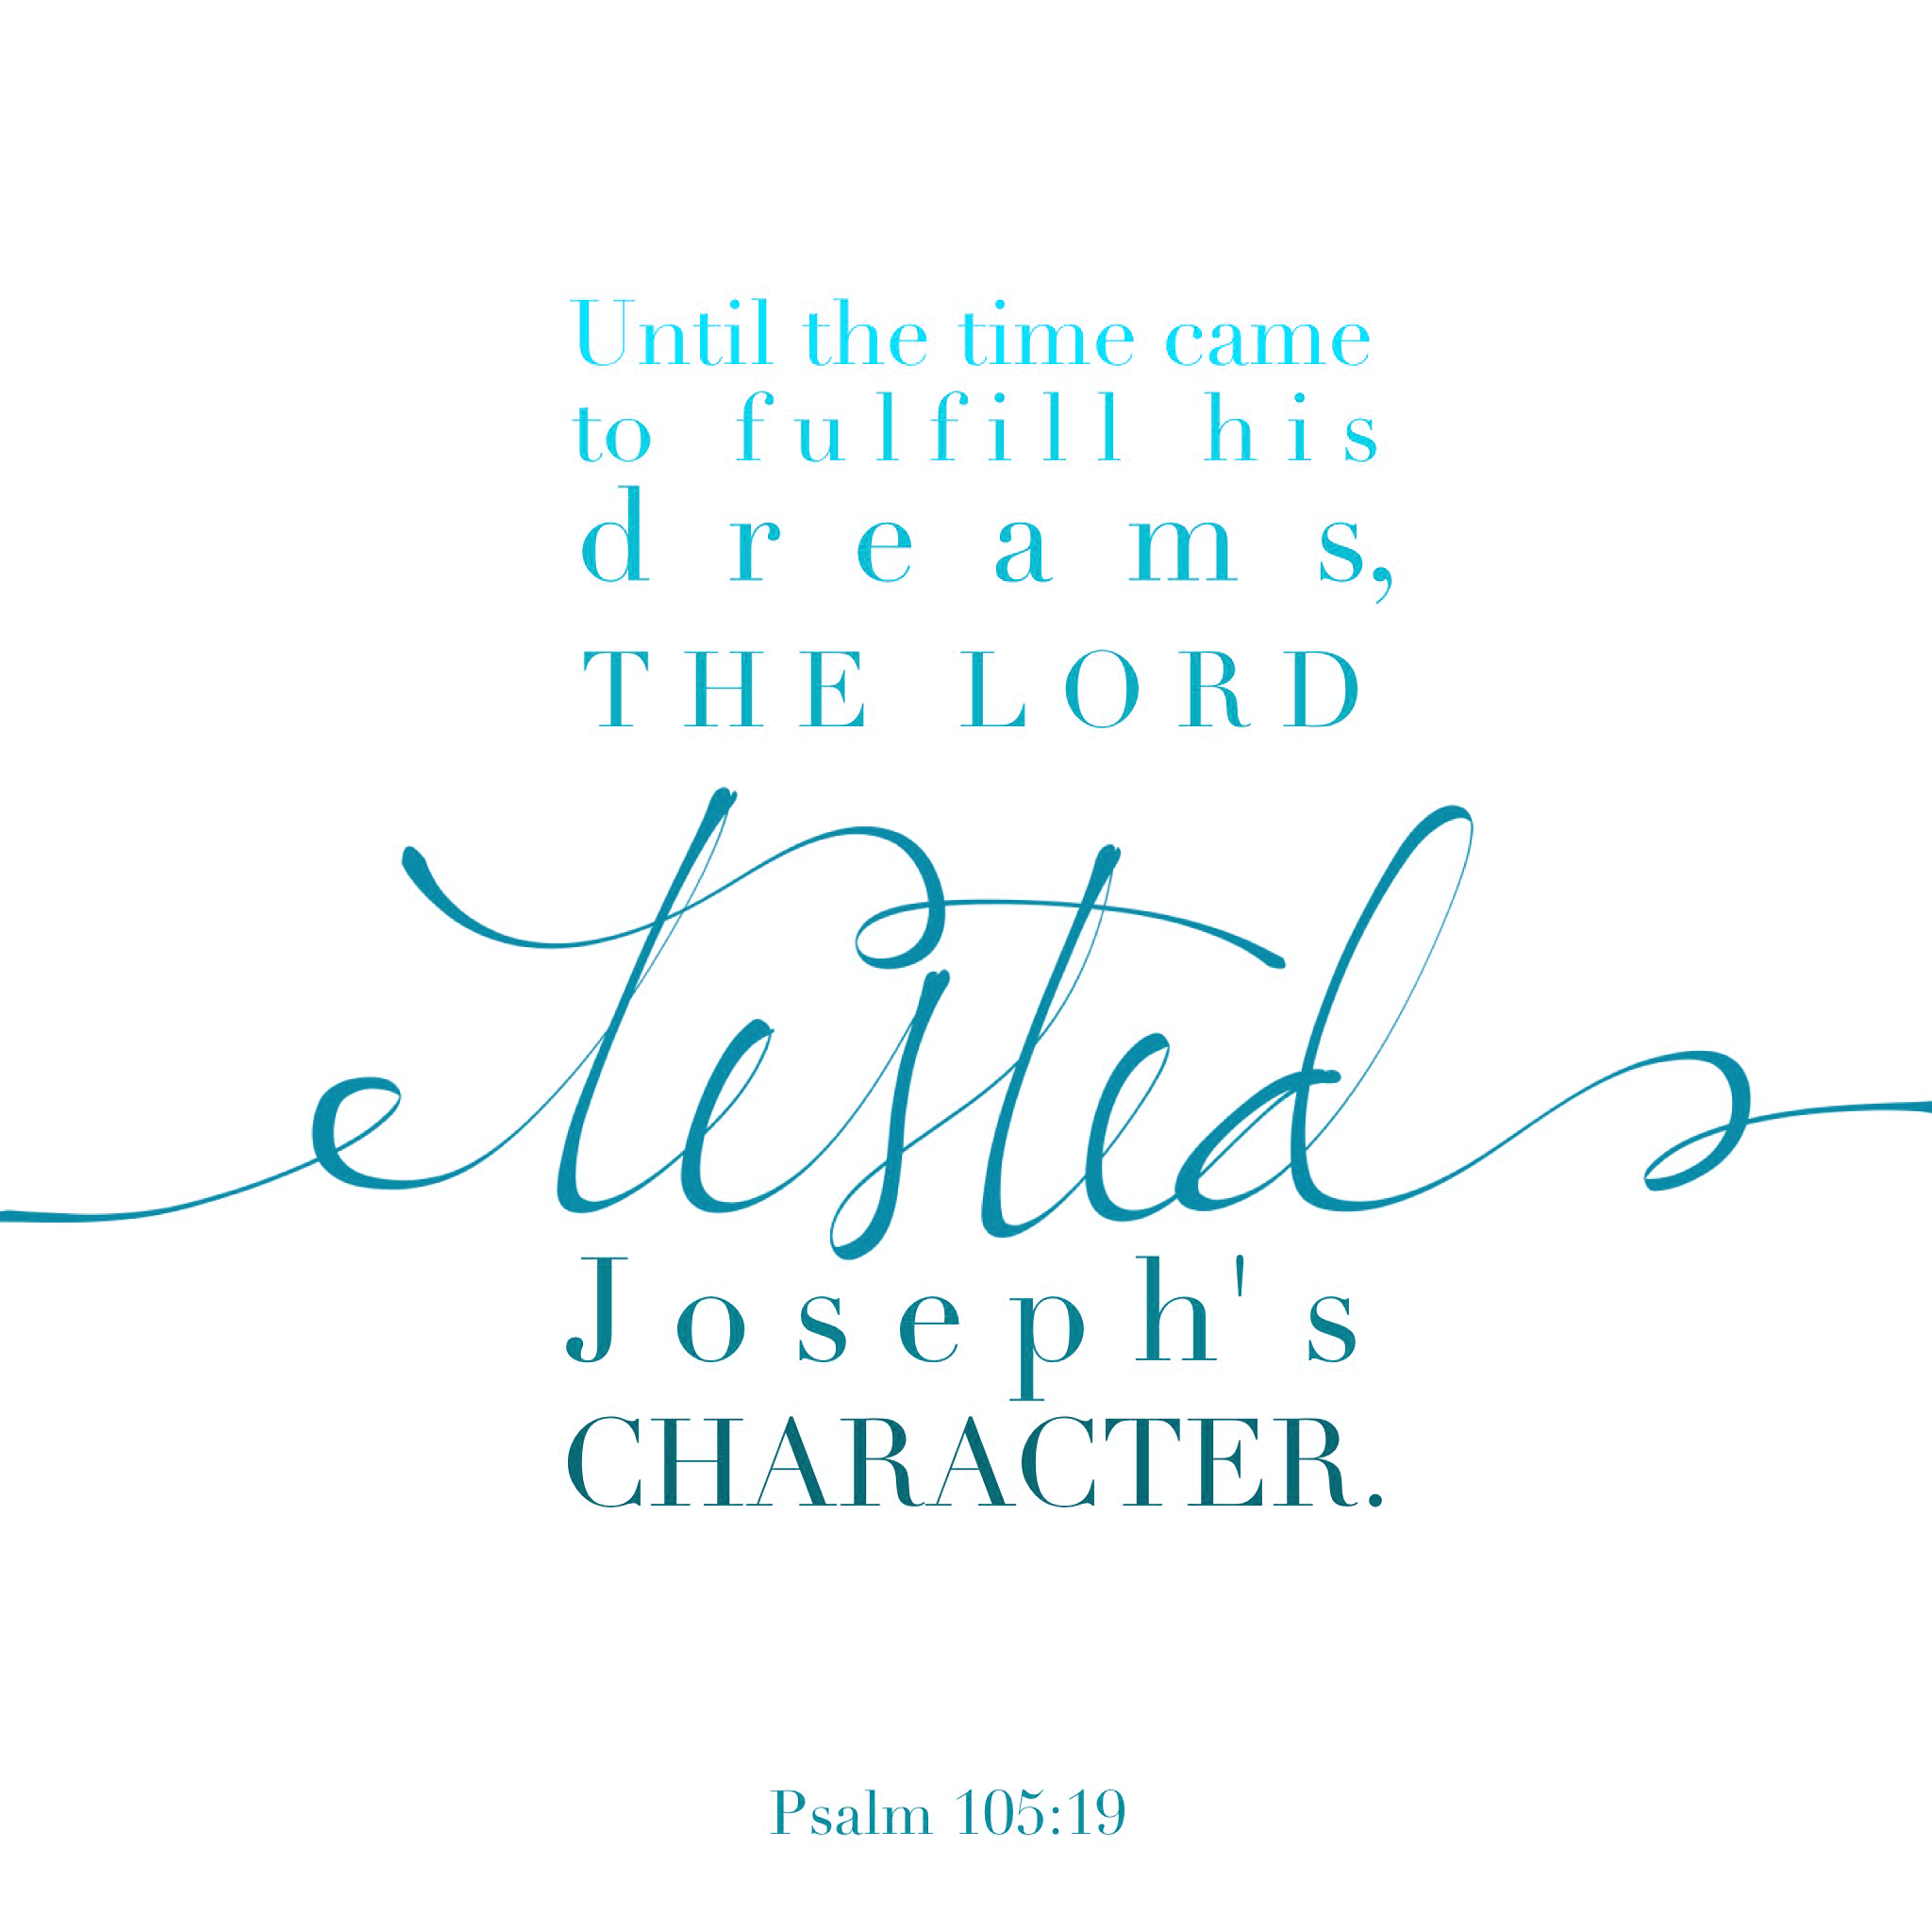 Psalm 105:19